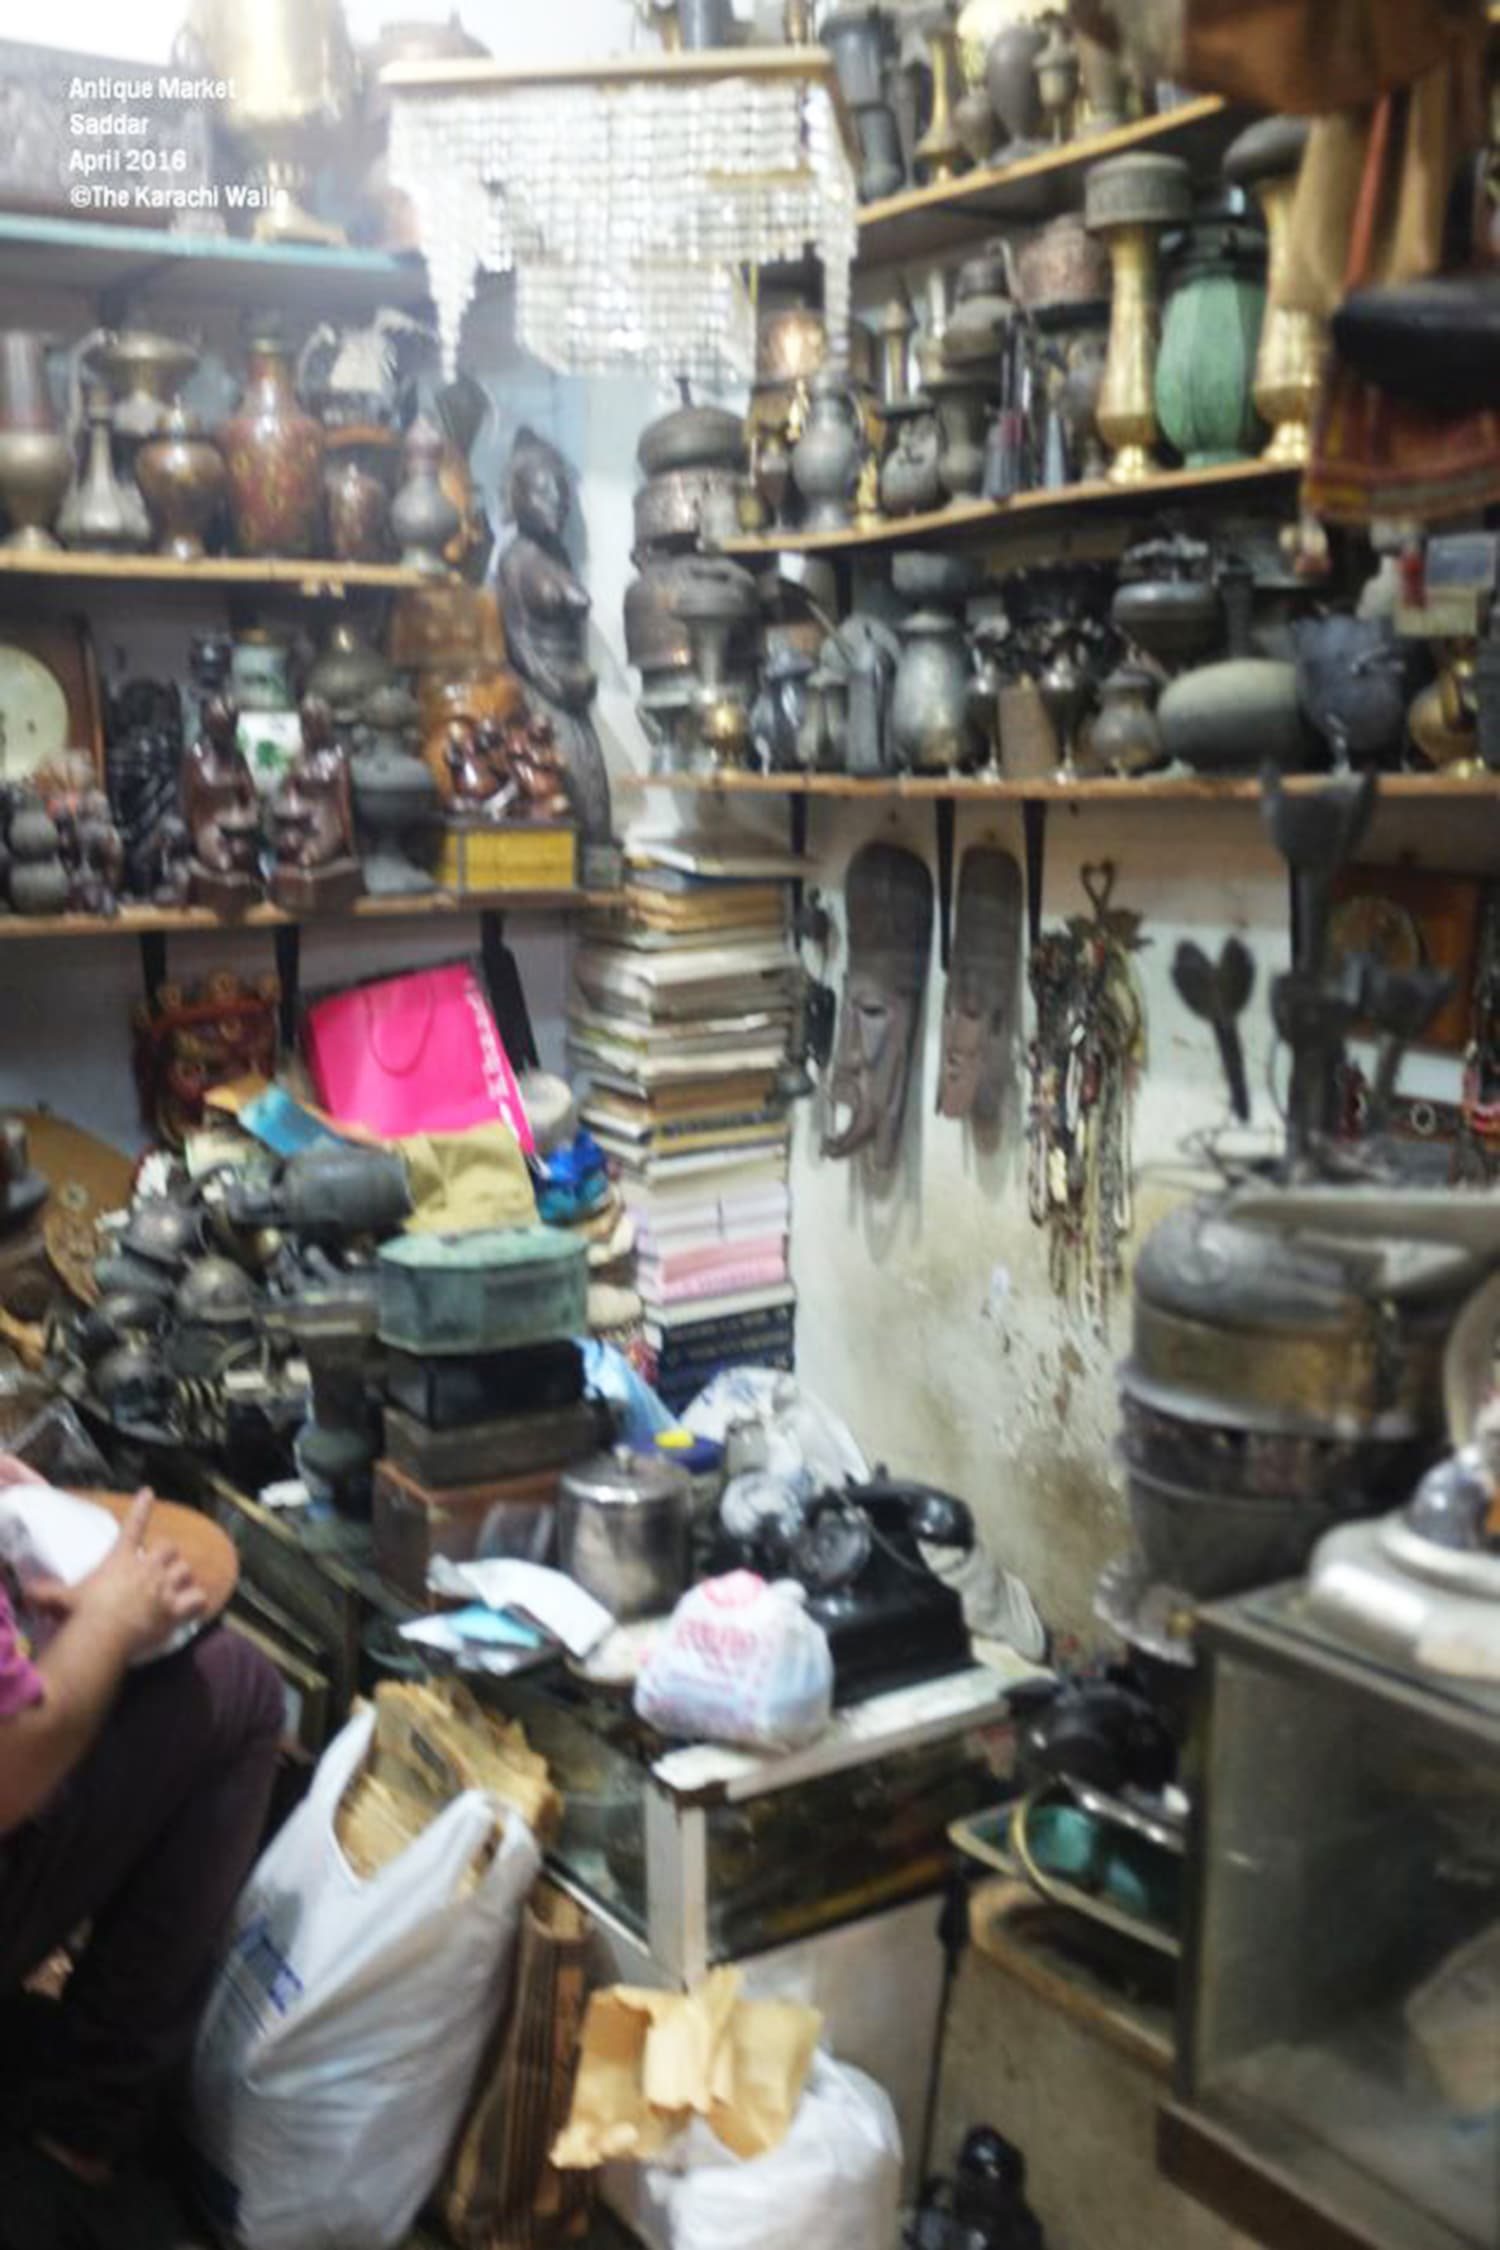 An antique market in Karachi'